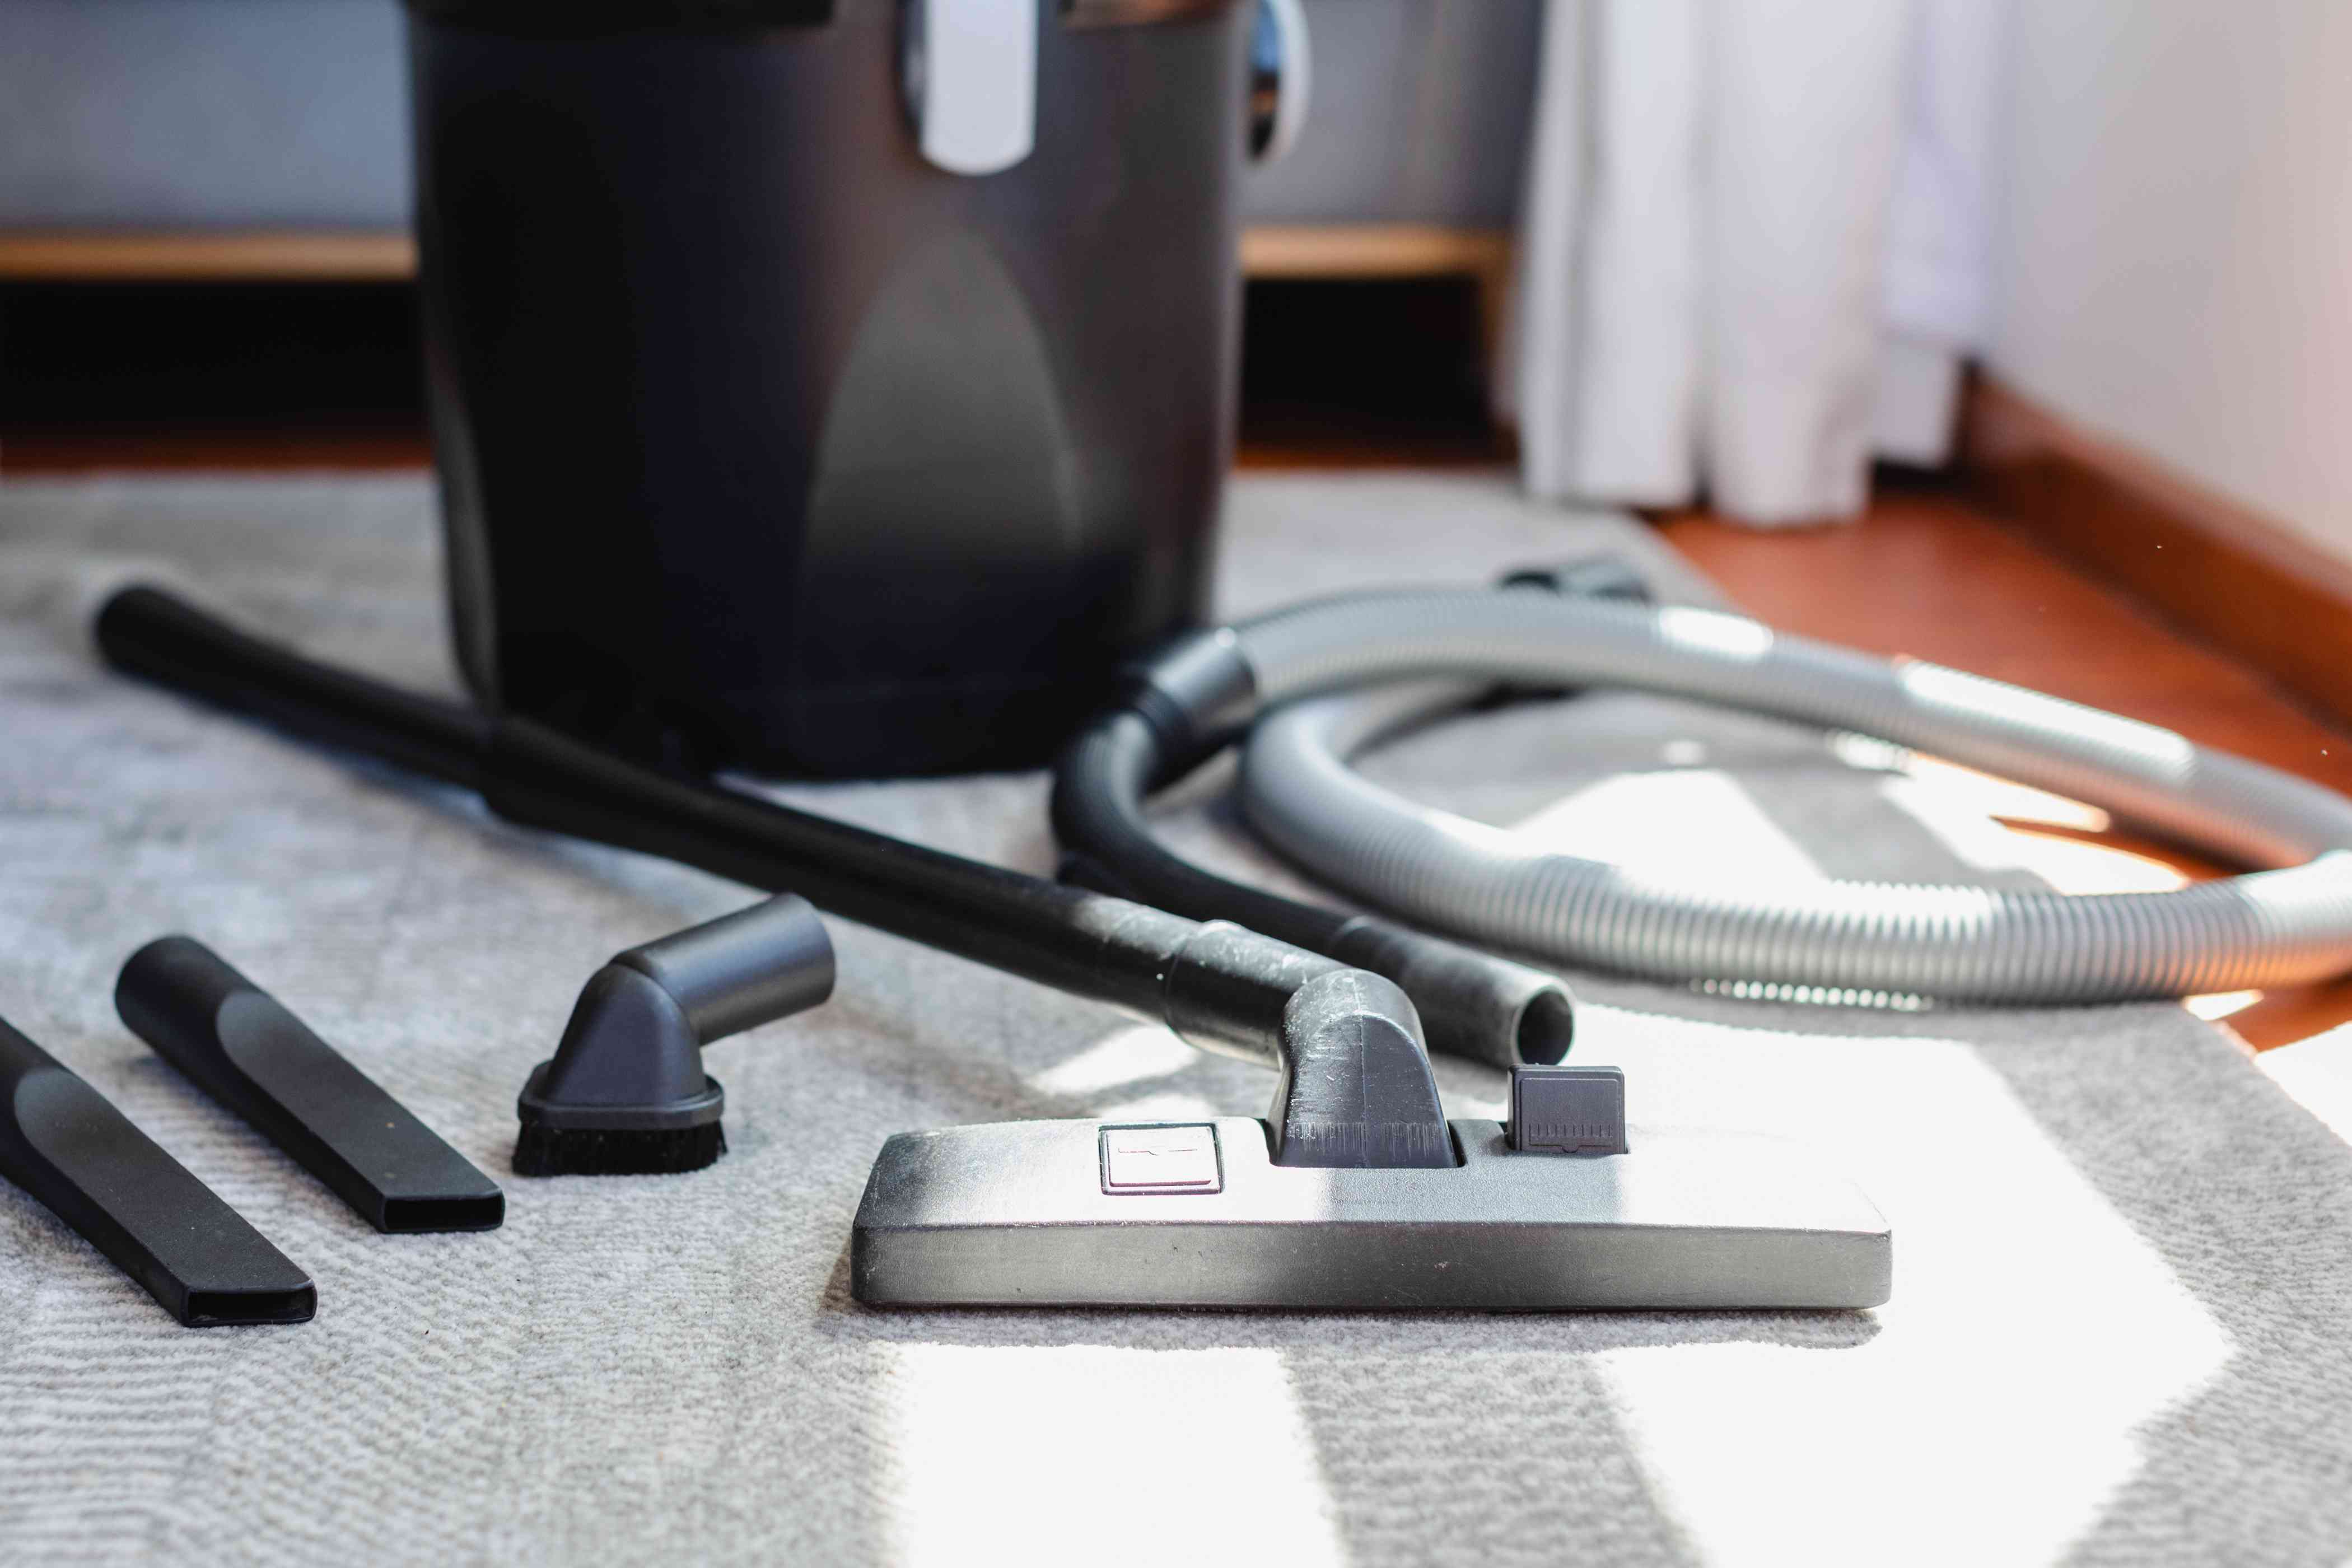 Upright vacuum cleaner with hose adjustments laid on carpet